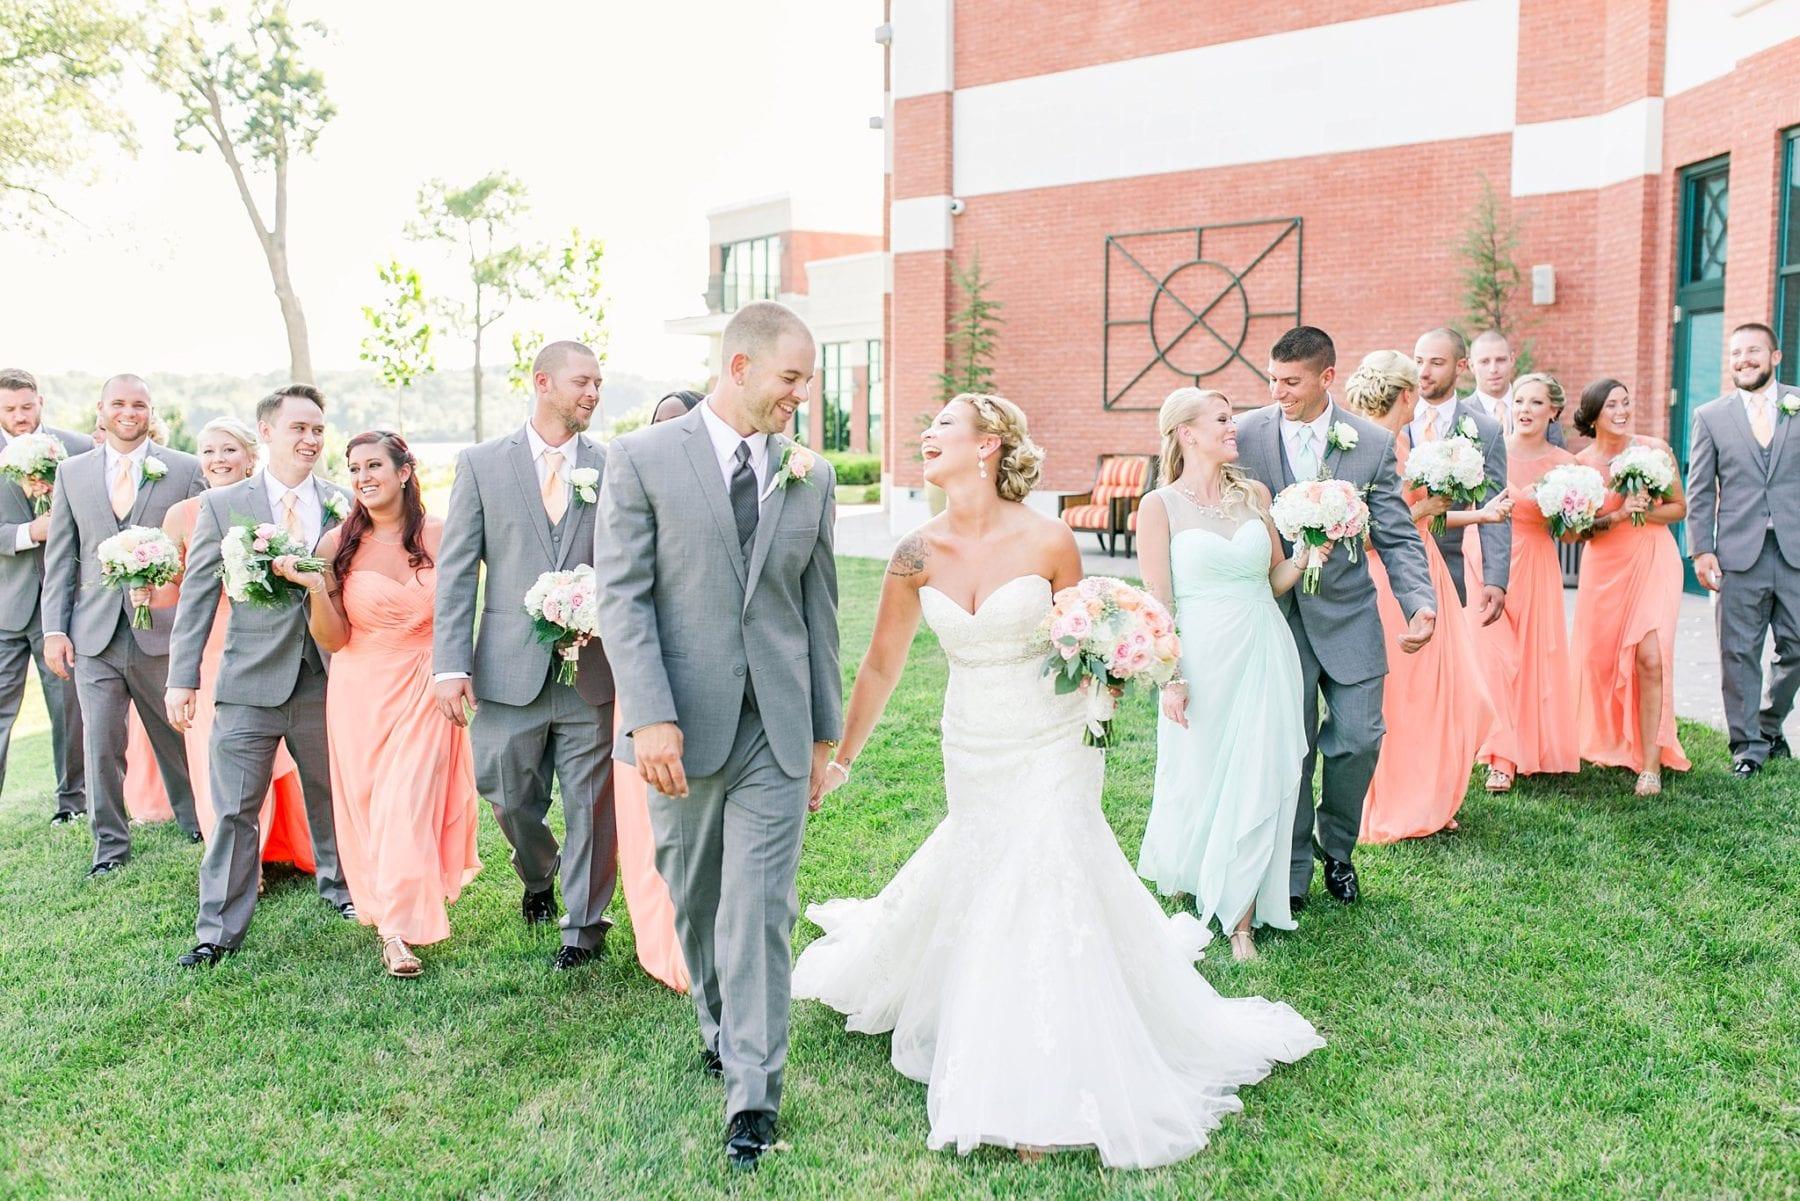 Waters Edge Wedding Photos Maryland Wedding Photographer Megan Kelsey Photography Katie & Conor-360.JPG